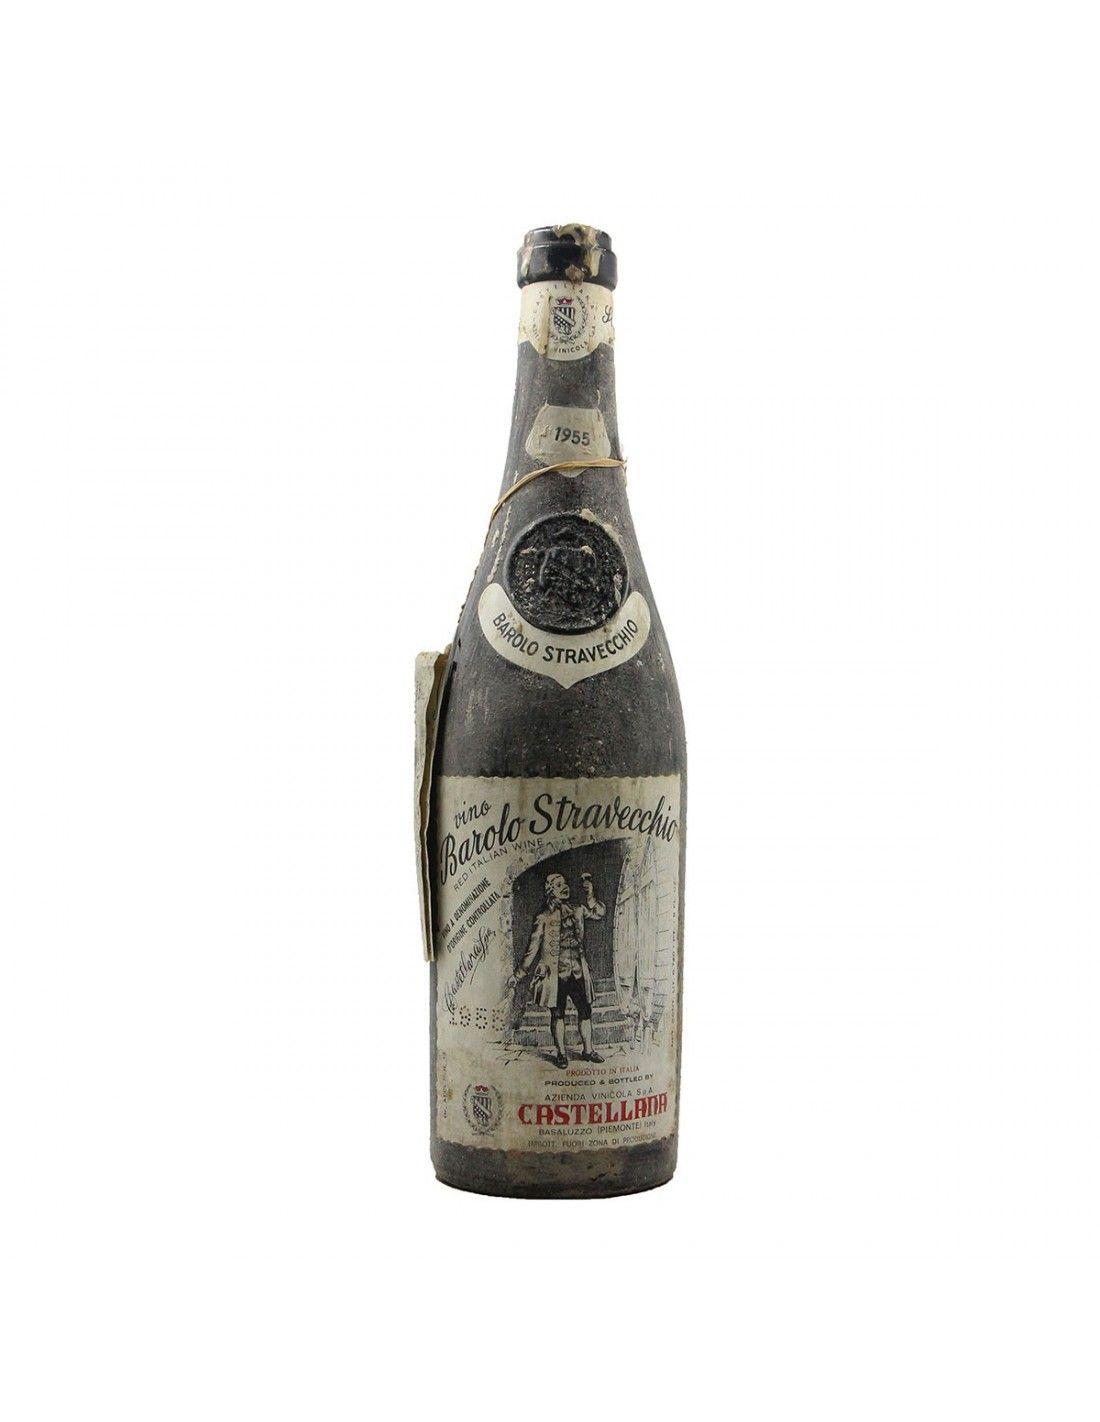 BAROLO STRAVECCHIO 1955 CASTELLANA Grandi Bottiglie